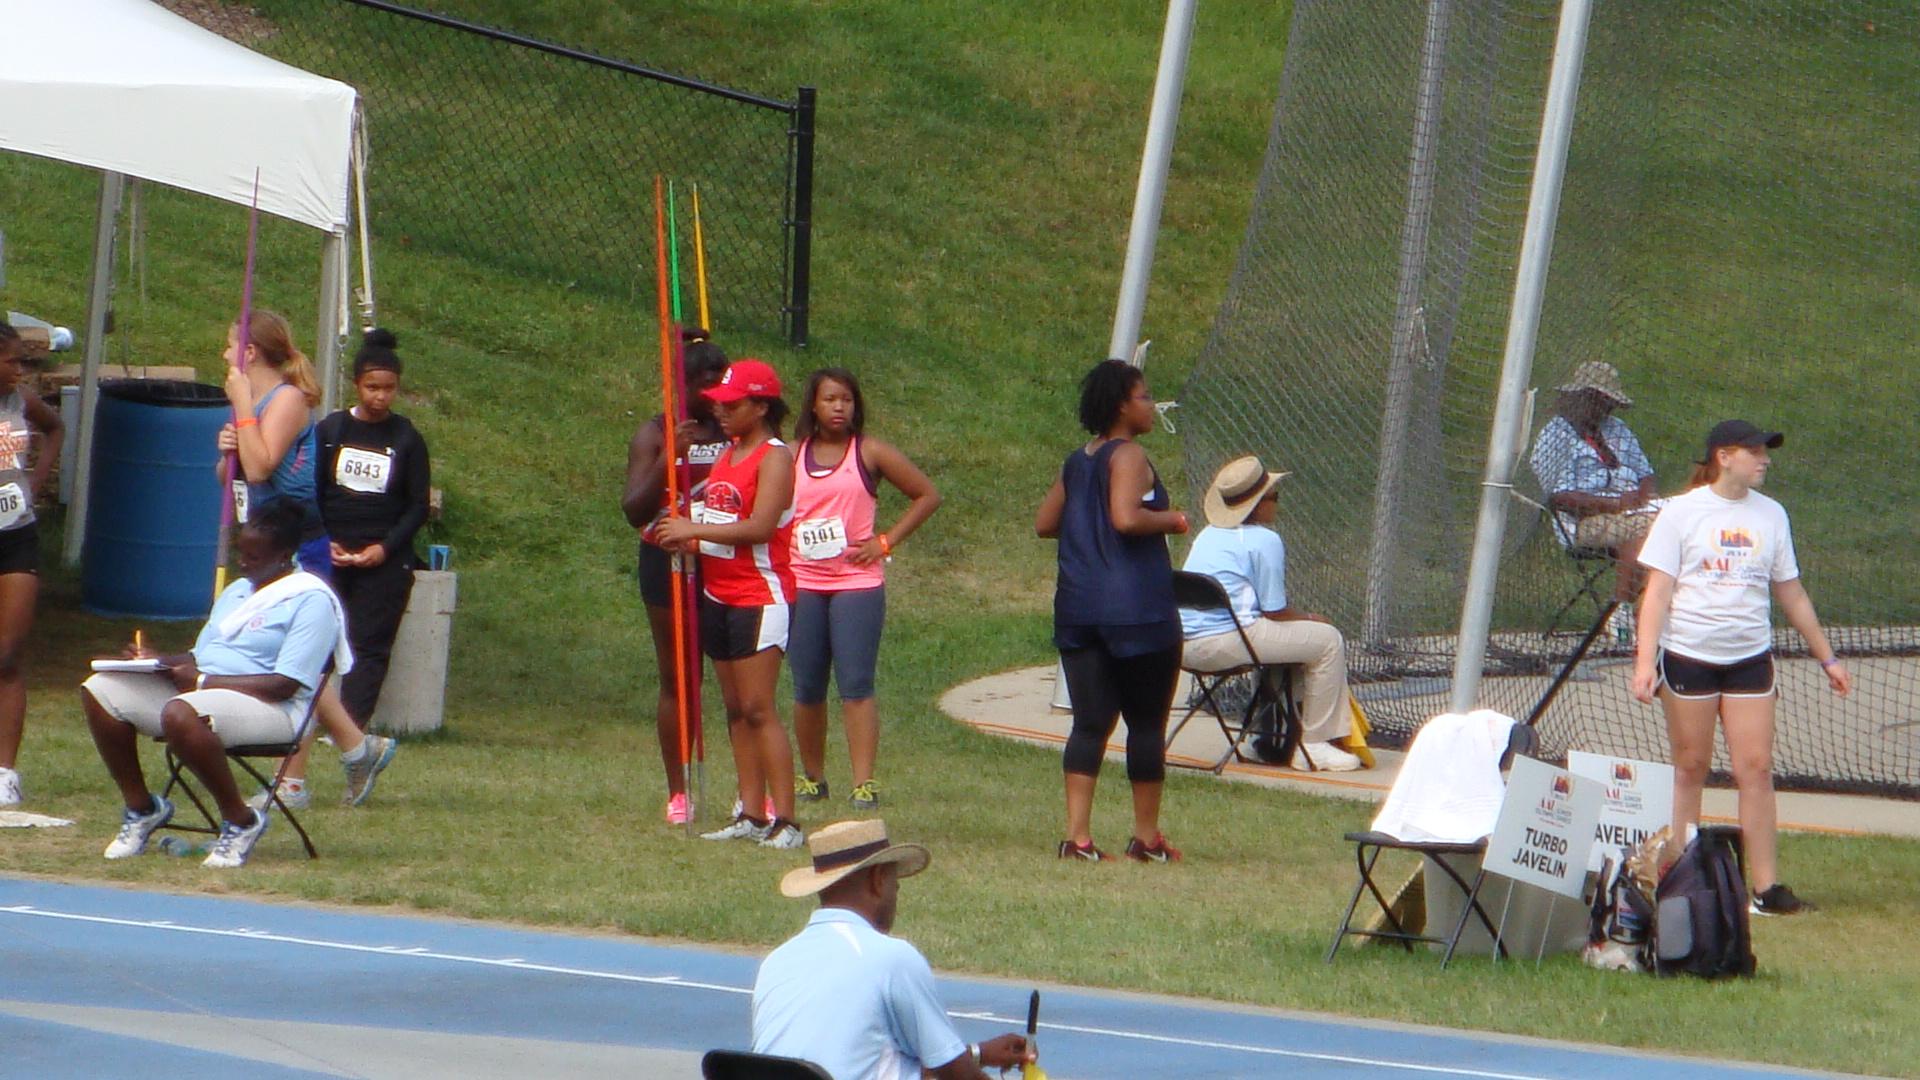 Maurisa awaiting her turn at the javelin